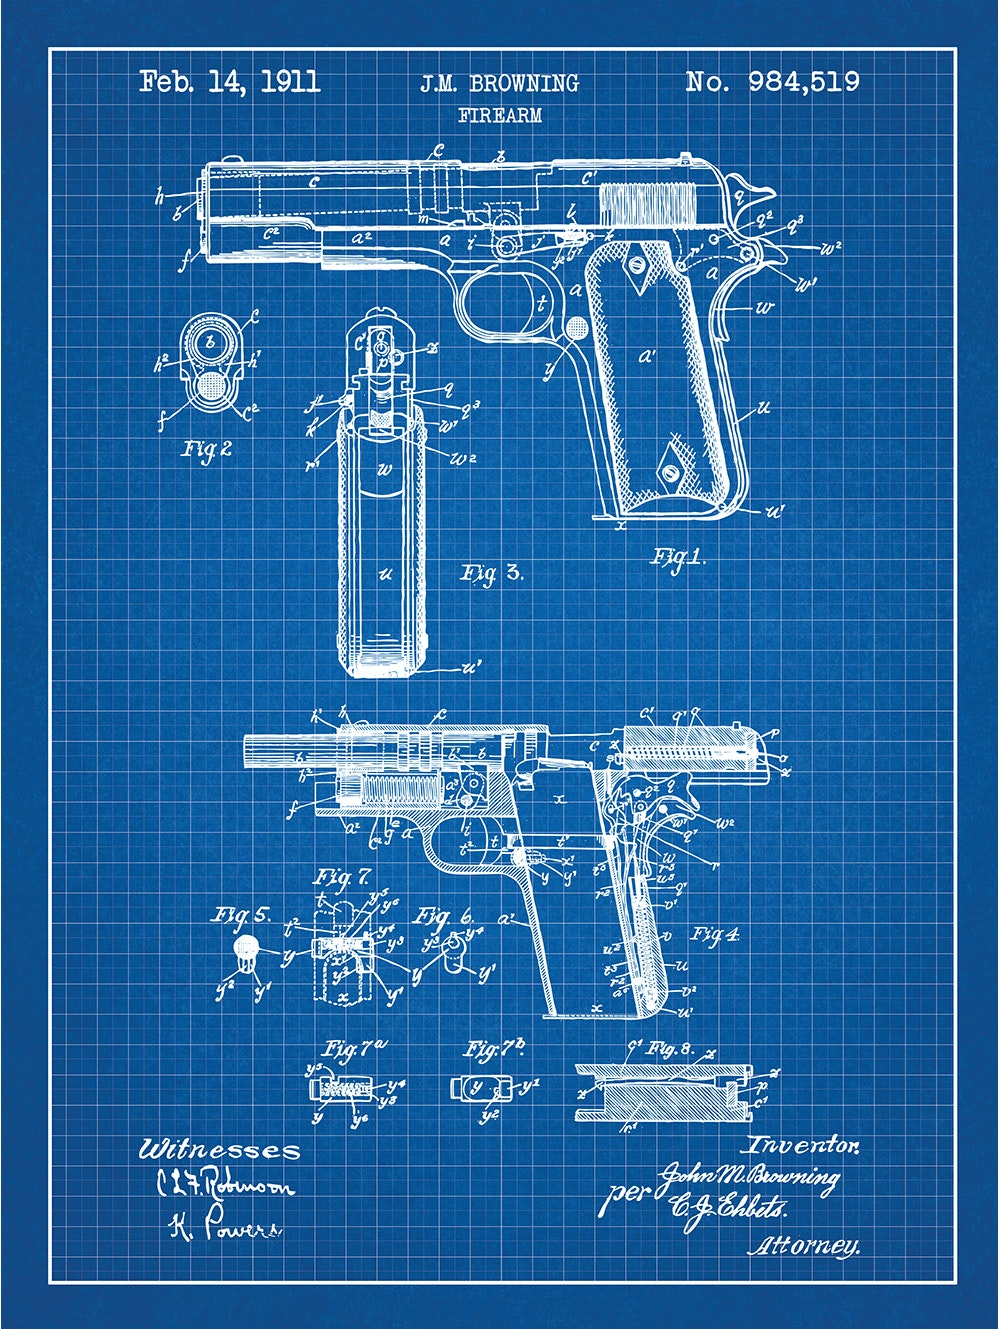 Browning Firearm - J.M. Browning - 1911 - 984,519